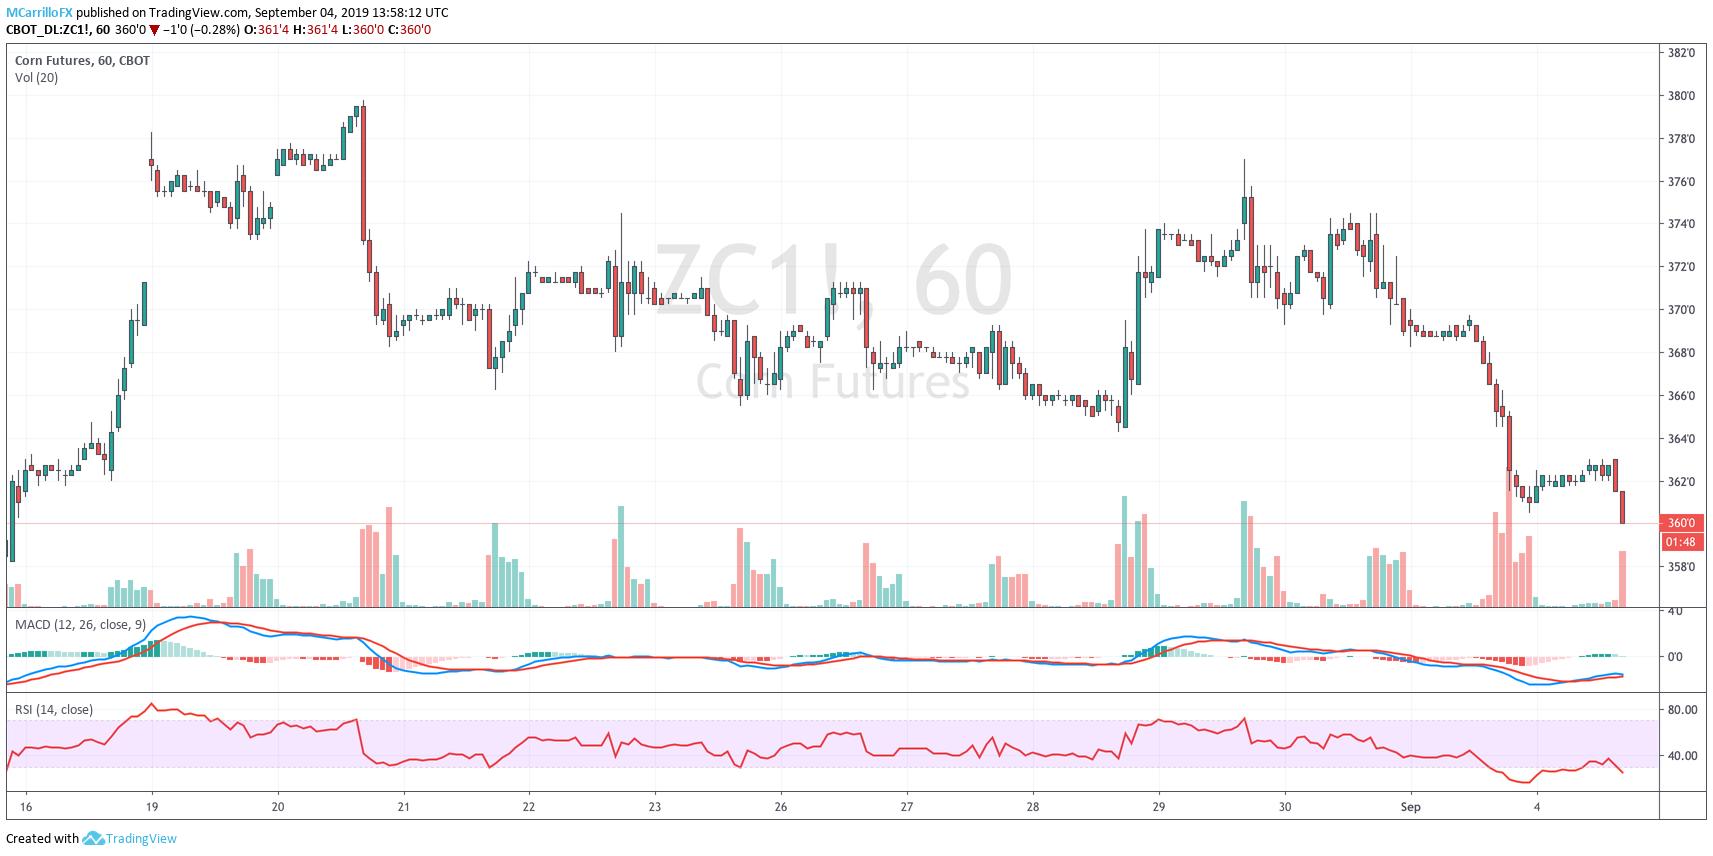 ZC1 Corn futures 1-hour chart September 4